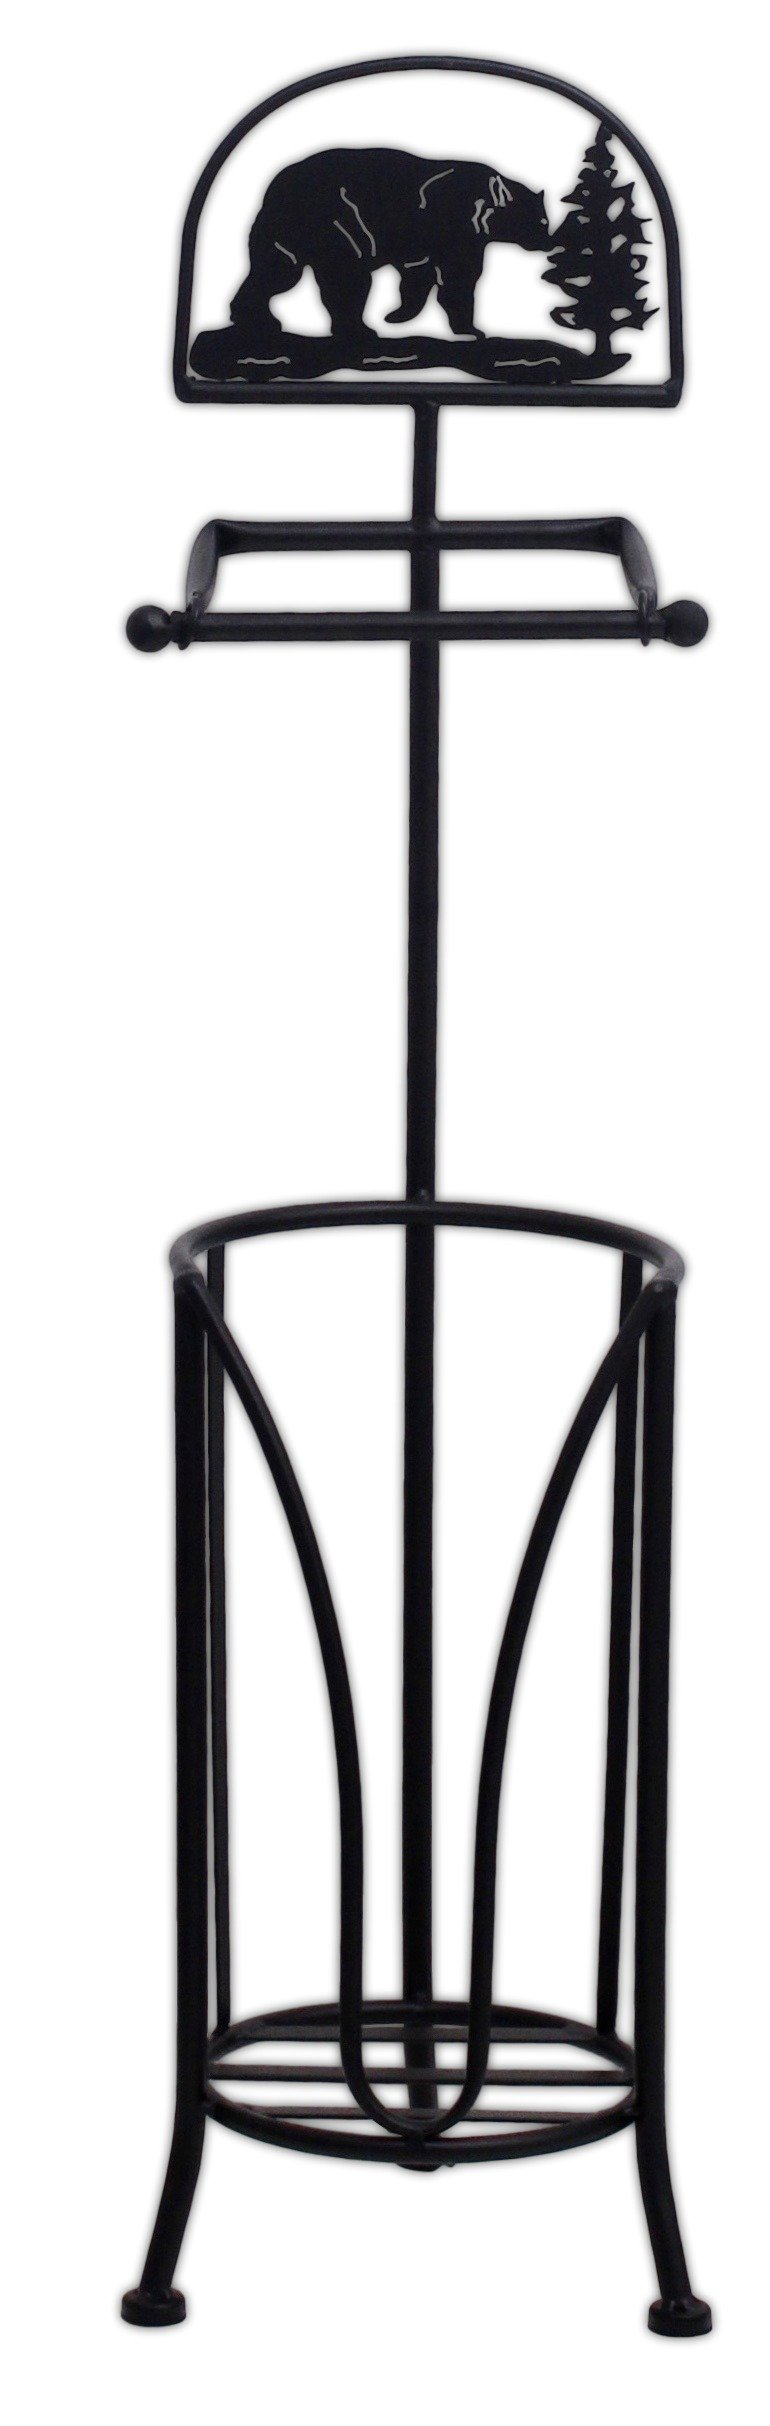 MayRich 29'' Metal Black Bear Toilet Paper Holder Stand